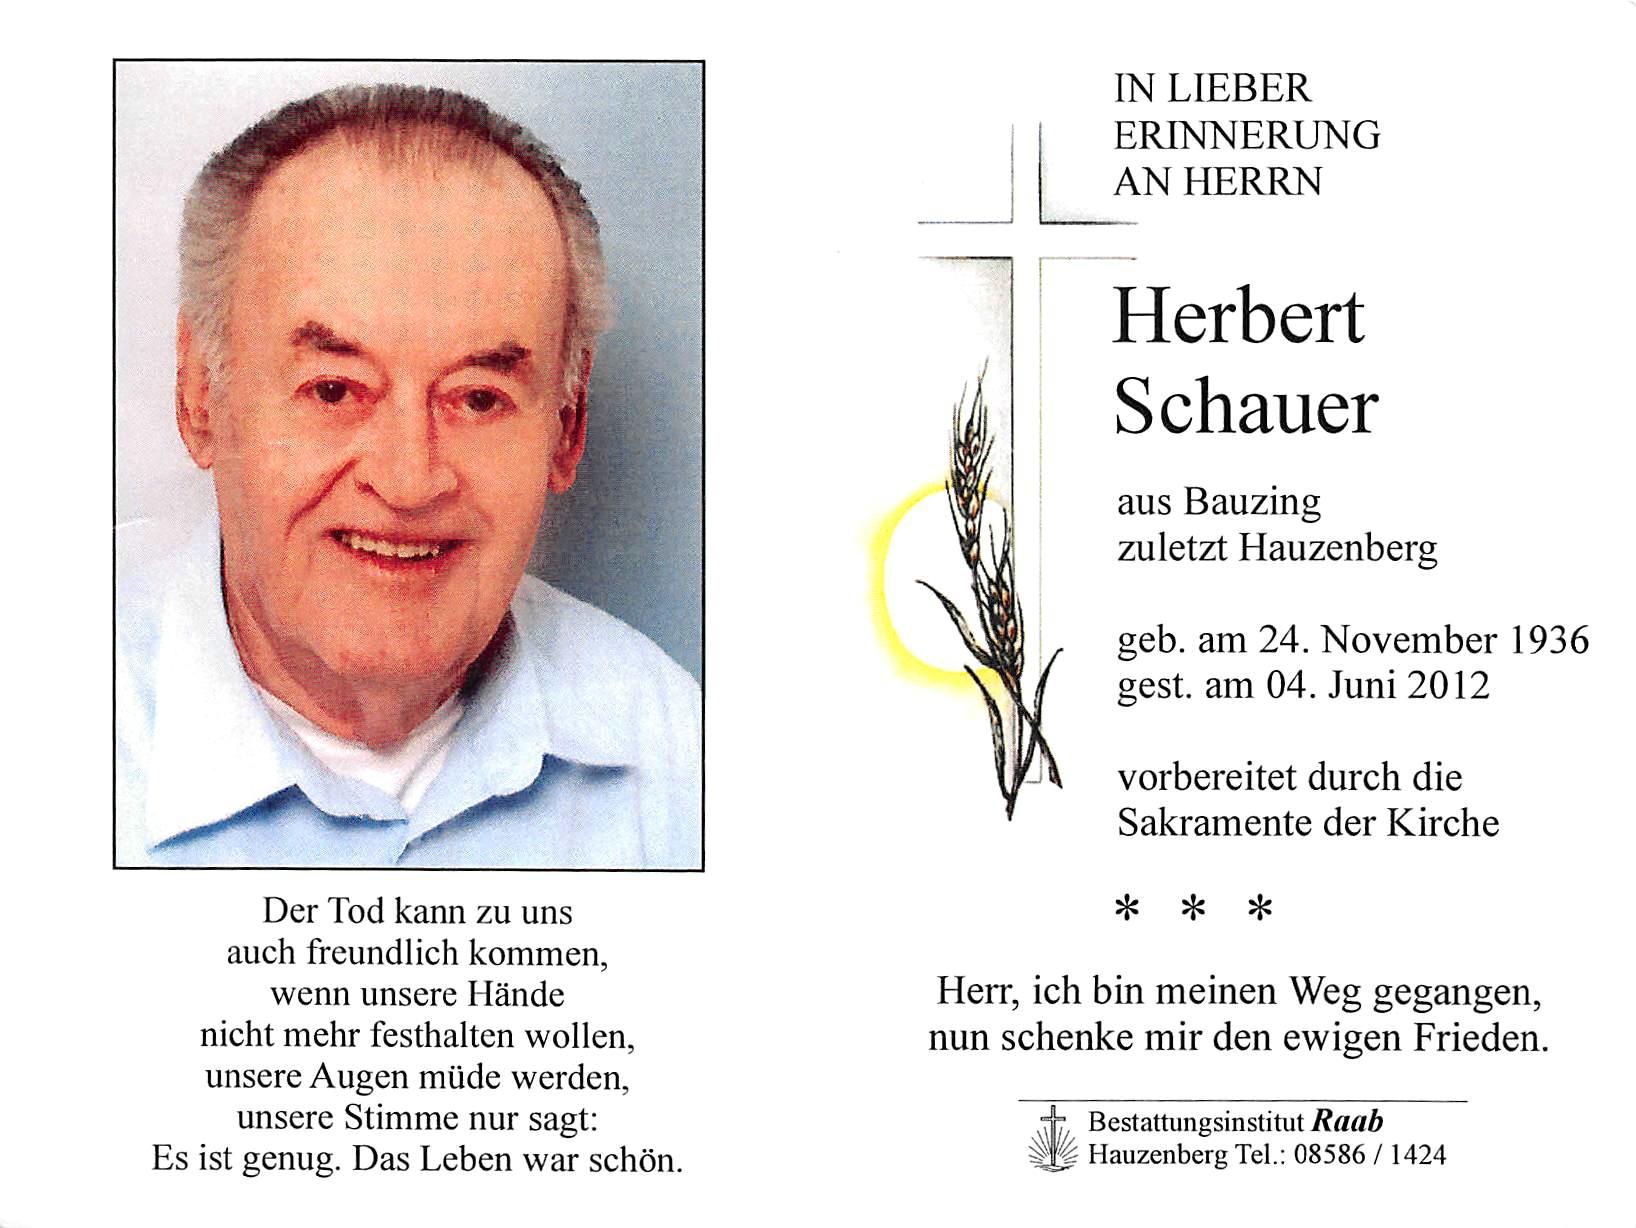 2012-06-04-Schauer-Herbert-Bauzing-Steinhauer-Harry